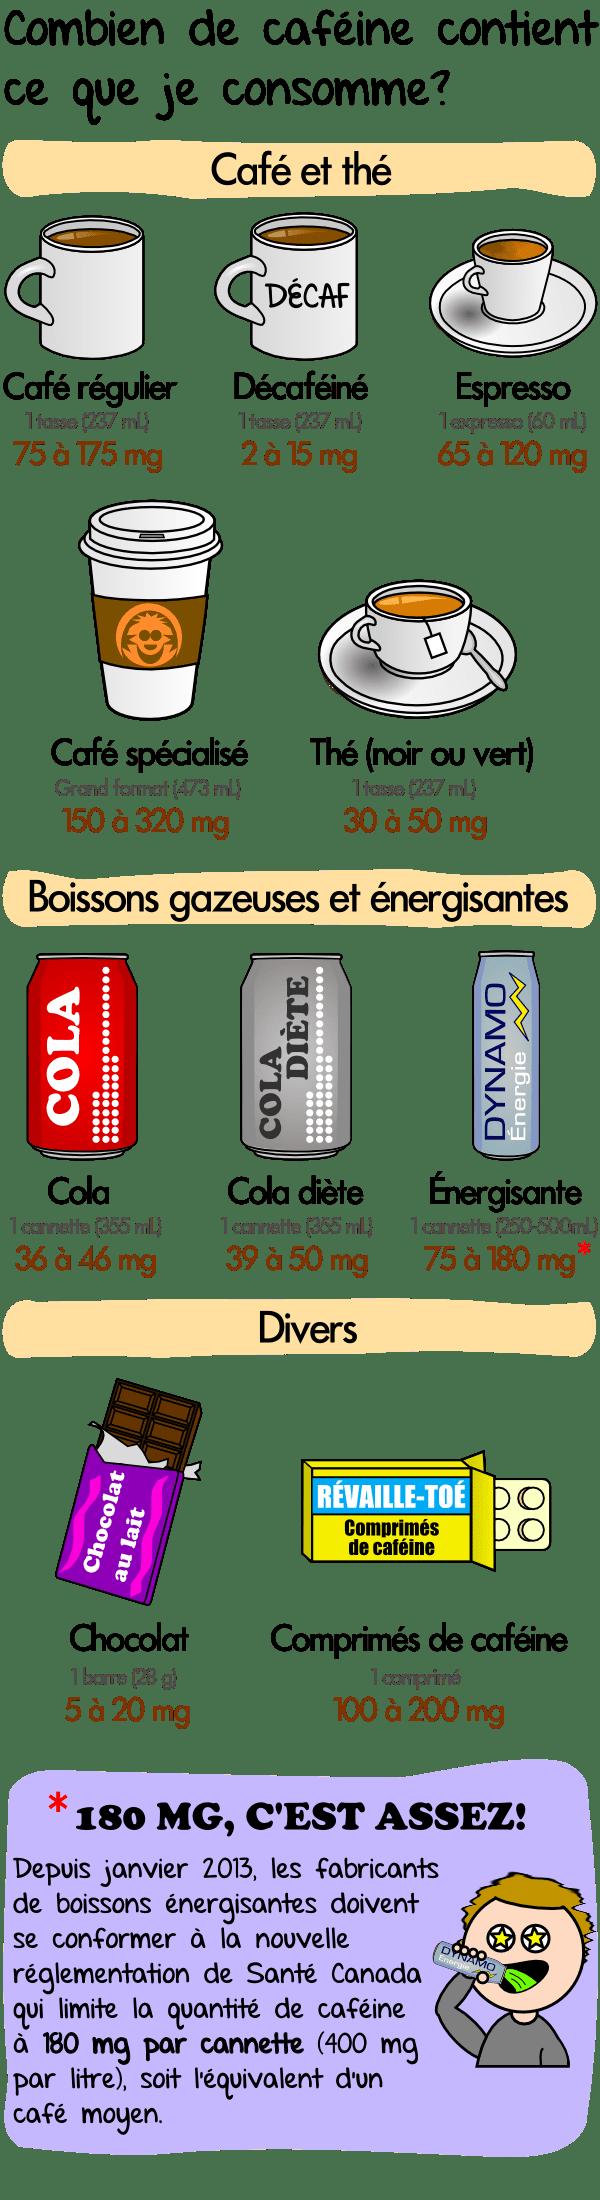 étude de perte de poids de caféine